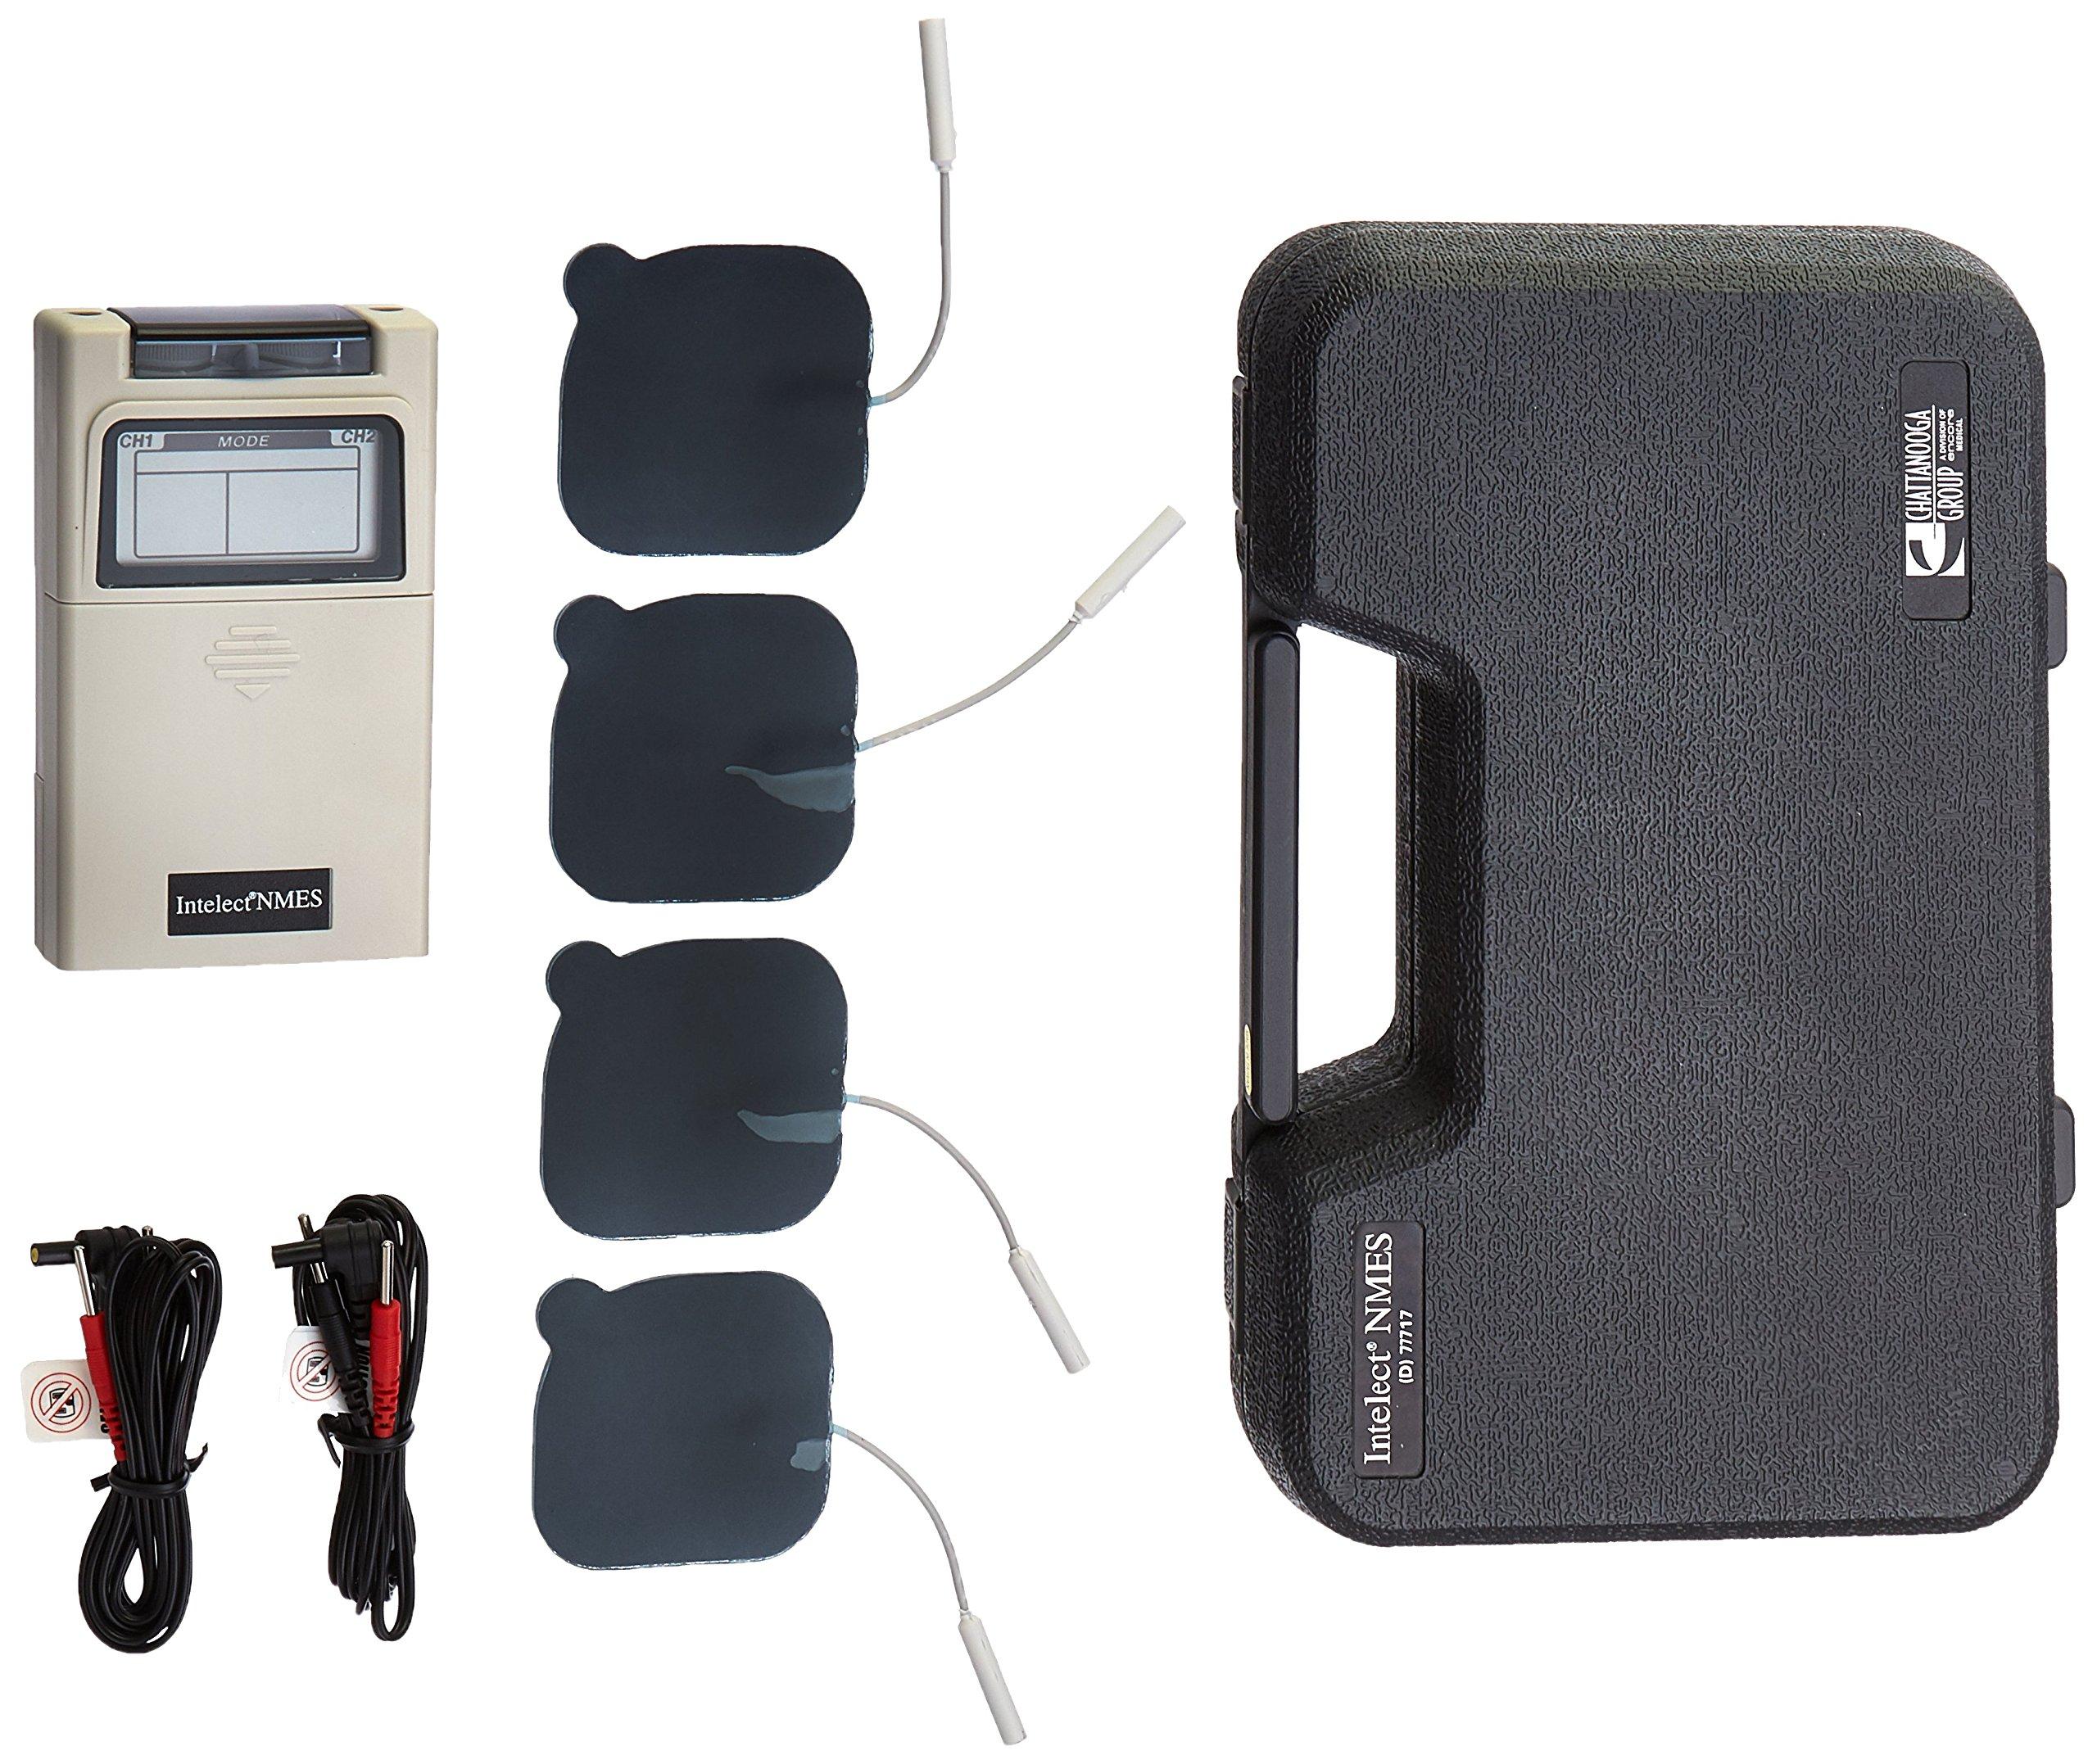 Intelect 07-7717 Digital NMES Stimulation Unit by Intelect